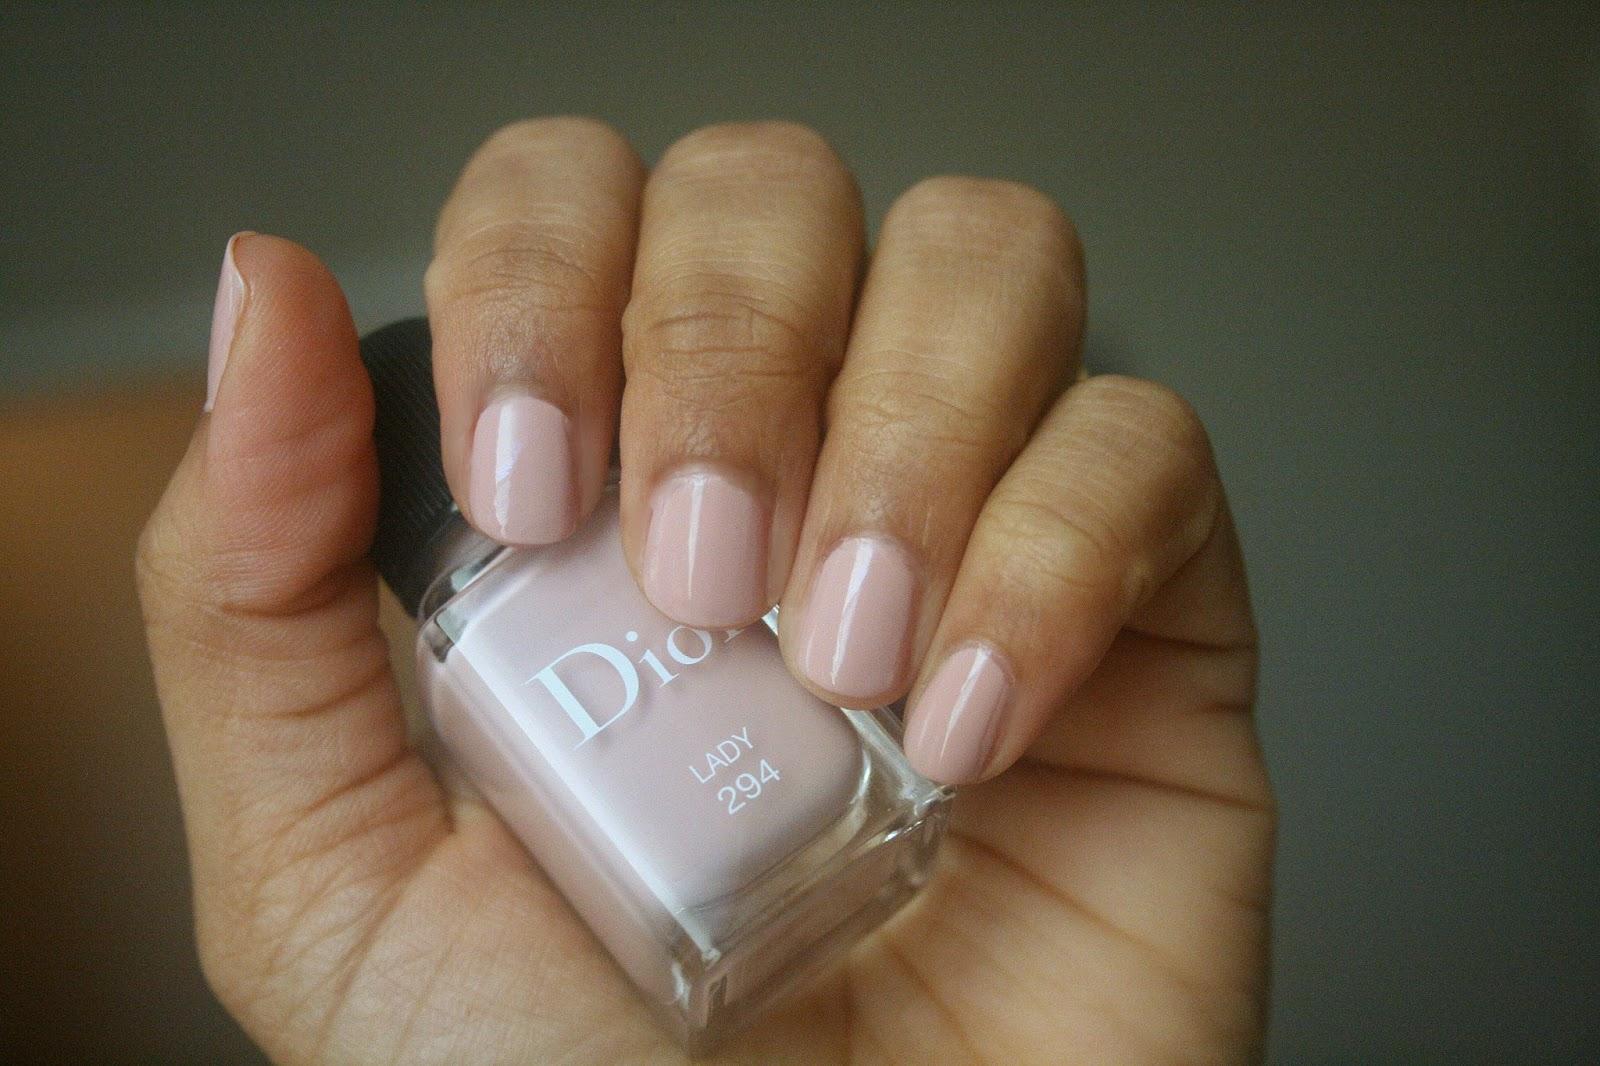 Dior Vernis Lady #294 Swatch